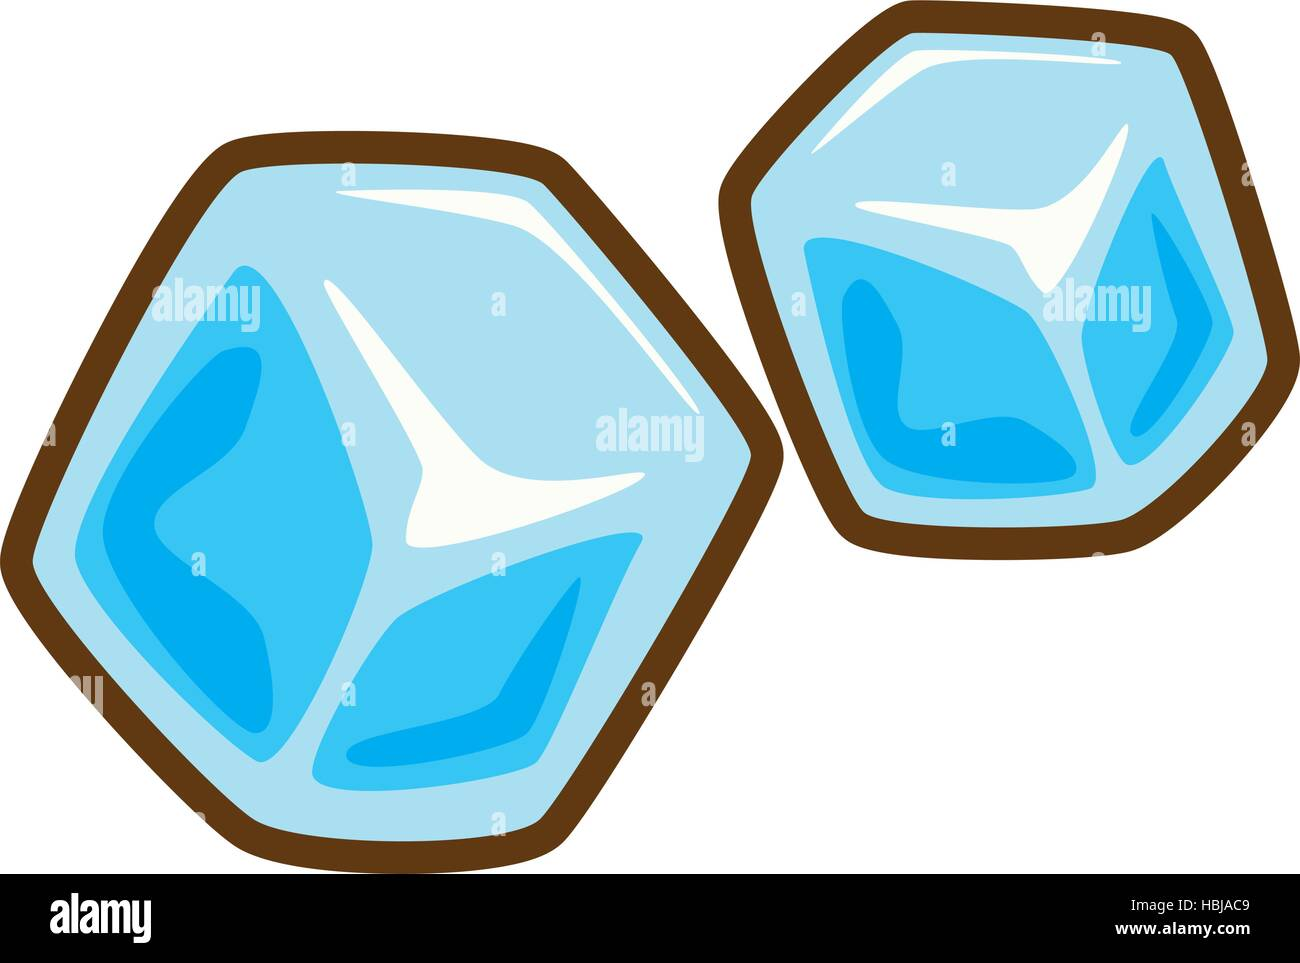 cartoon ice cubes frozen water stock photos cartoon ice cubes rh alamy com cartoon ice cube melting cartoon ice cube clip art